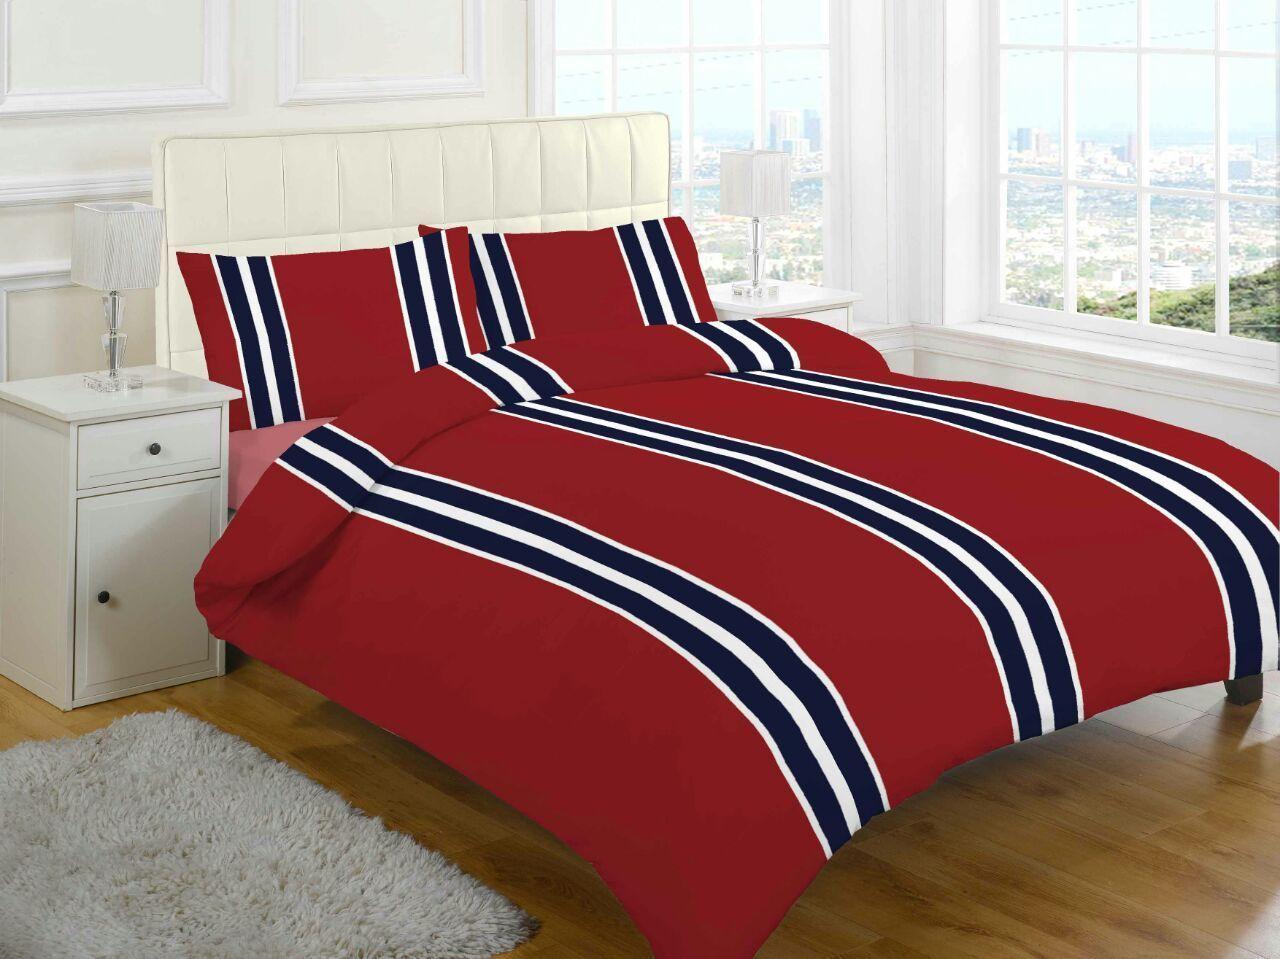 Brody Flannelette Sheet Set Discount bedding sets, Linen